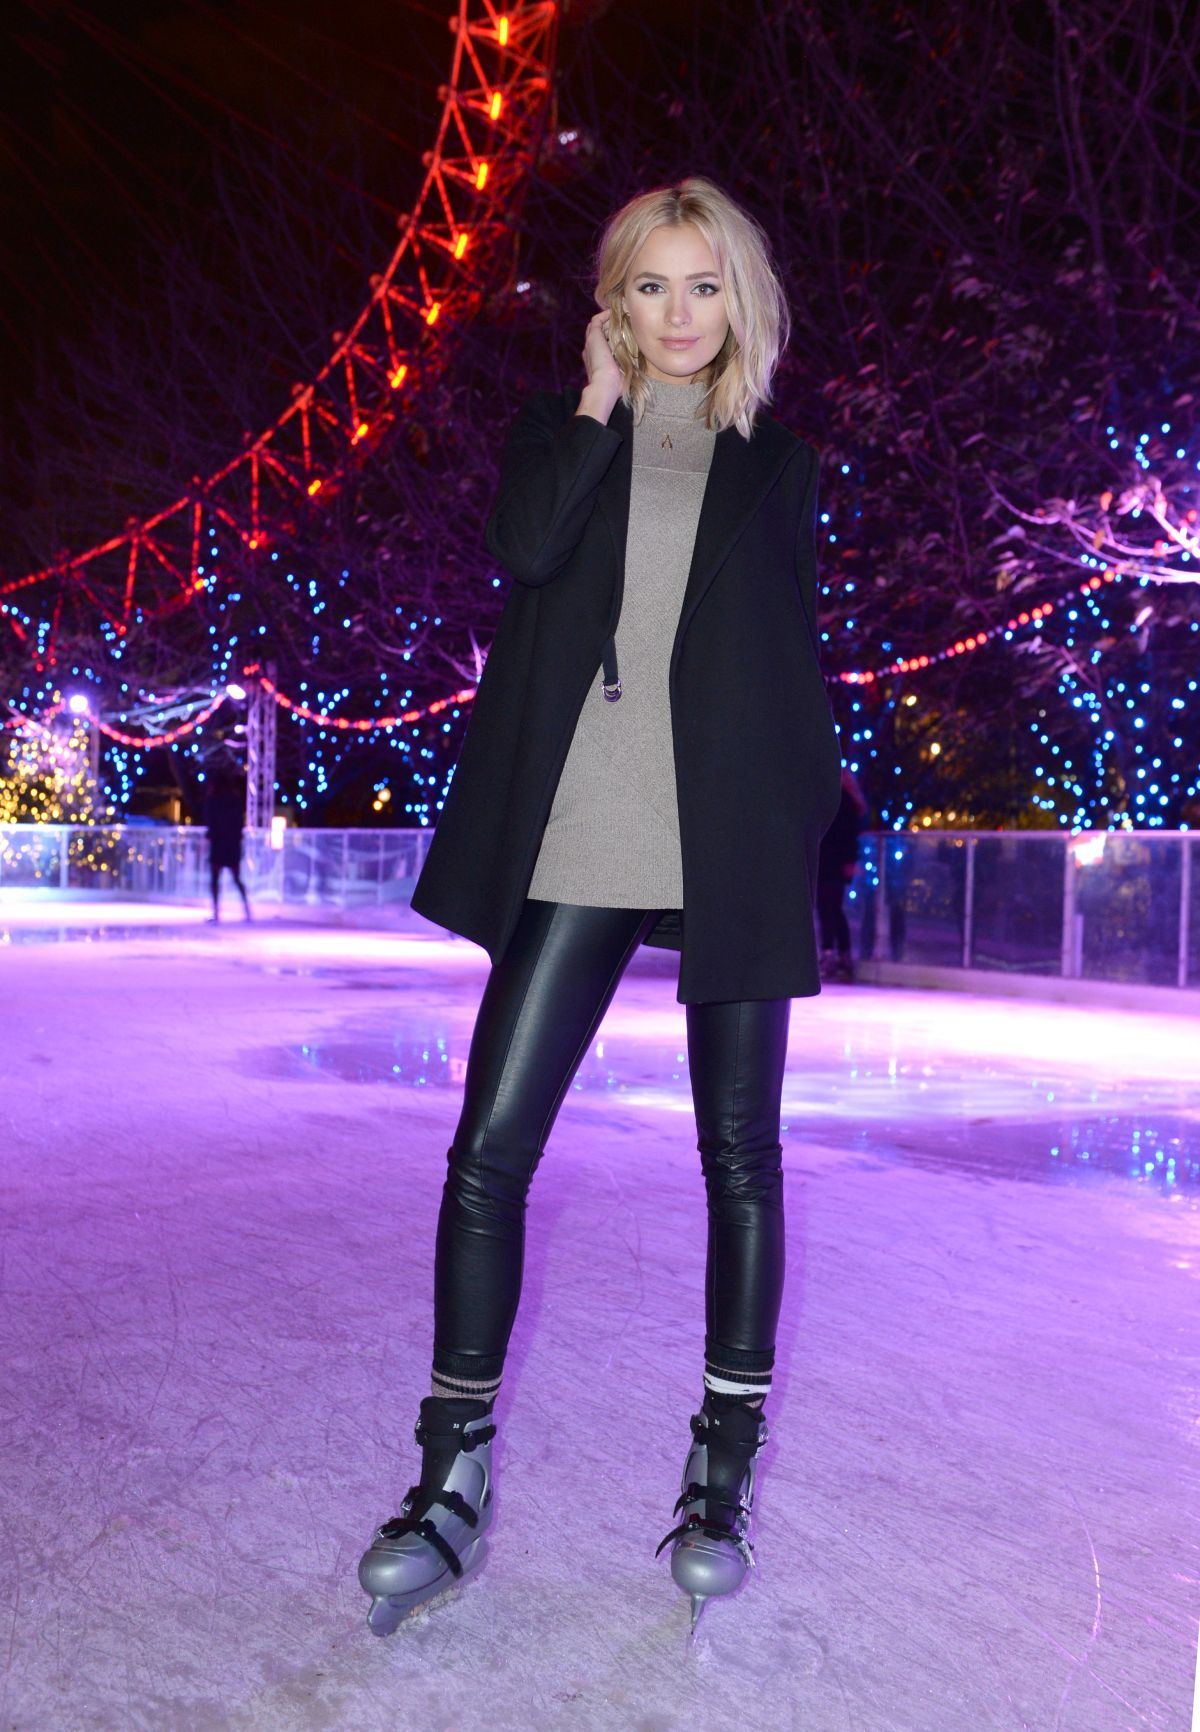 IANTHE ROSE COCHRANE at Coca Cola London Eye Frostival Eyeskate in London 11/18/2015